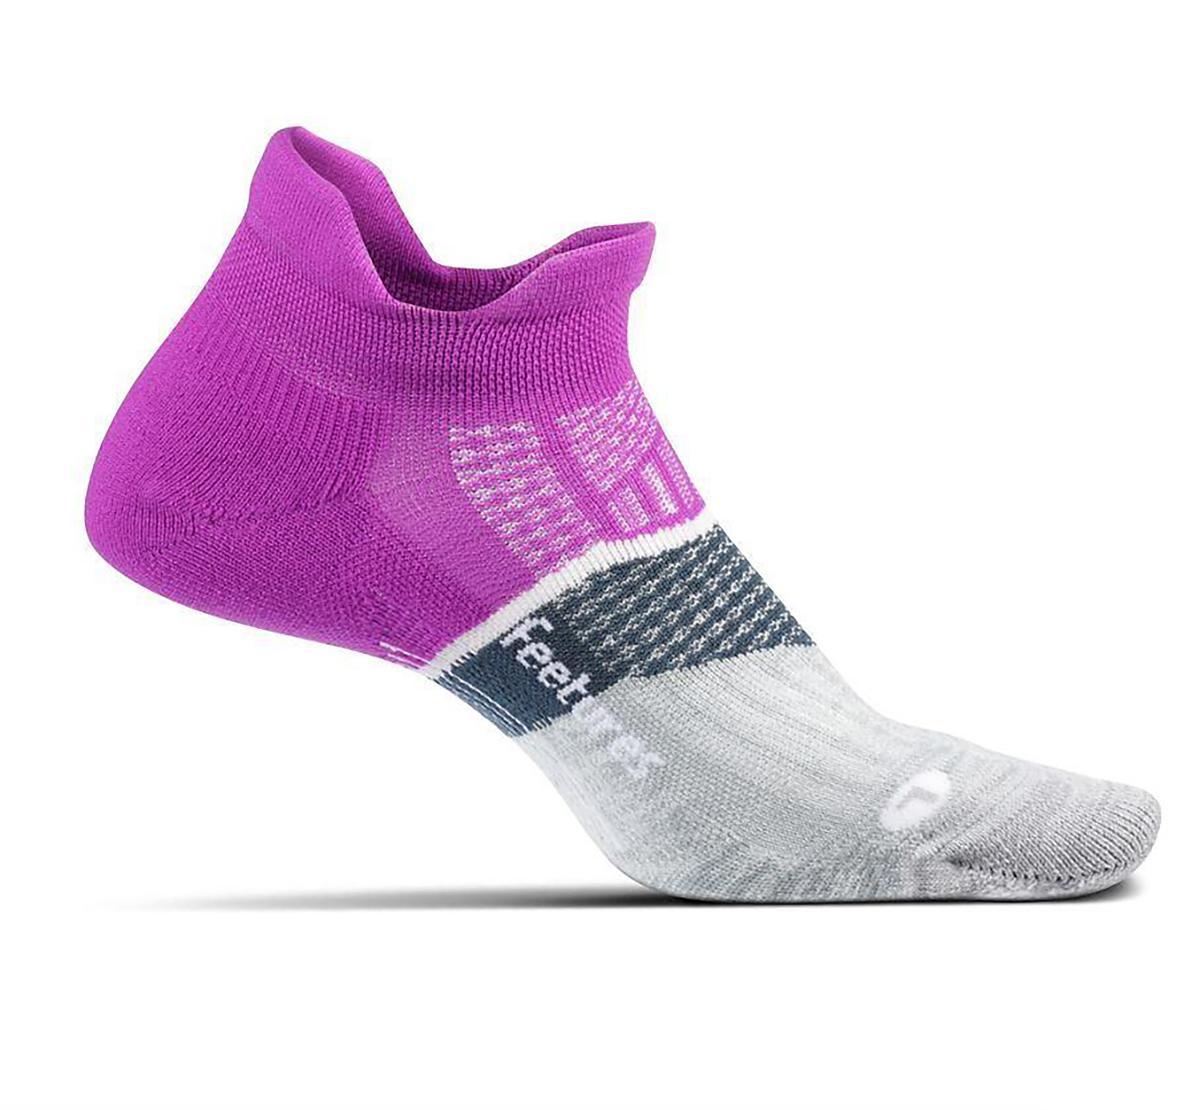 Feetures Elite Ultra Light Cushion No Show Tab Socks - Color: Purple Addict - Size: S, Purple Addict, large, image 1